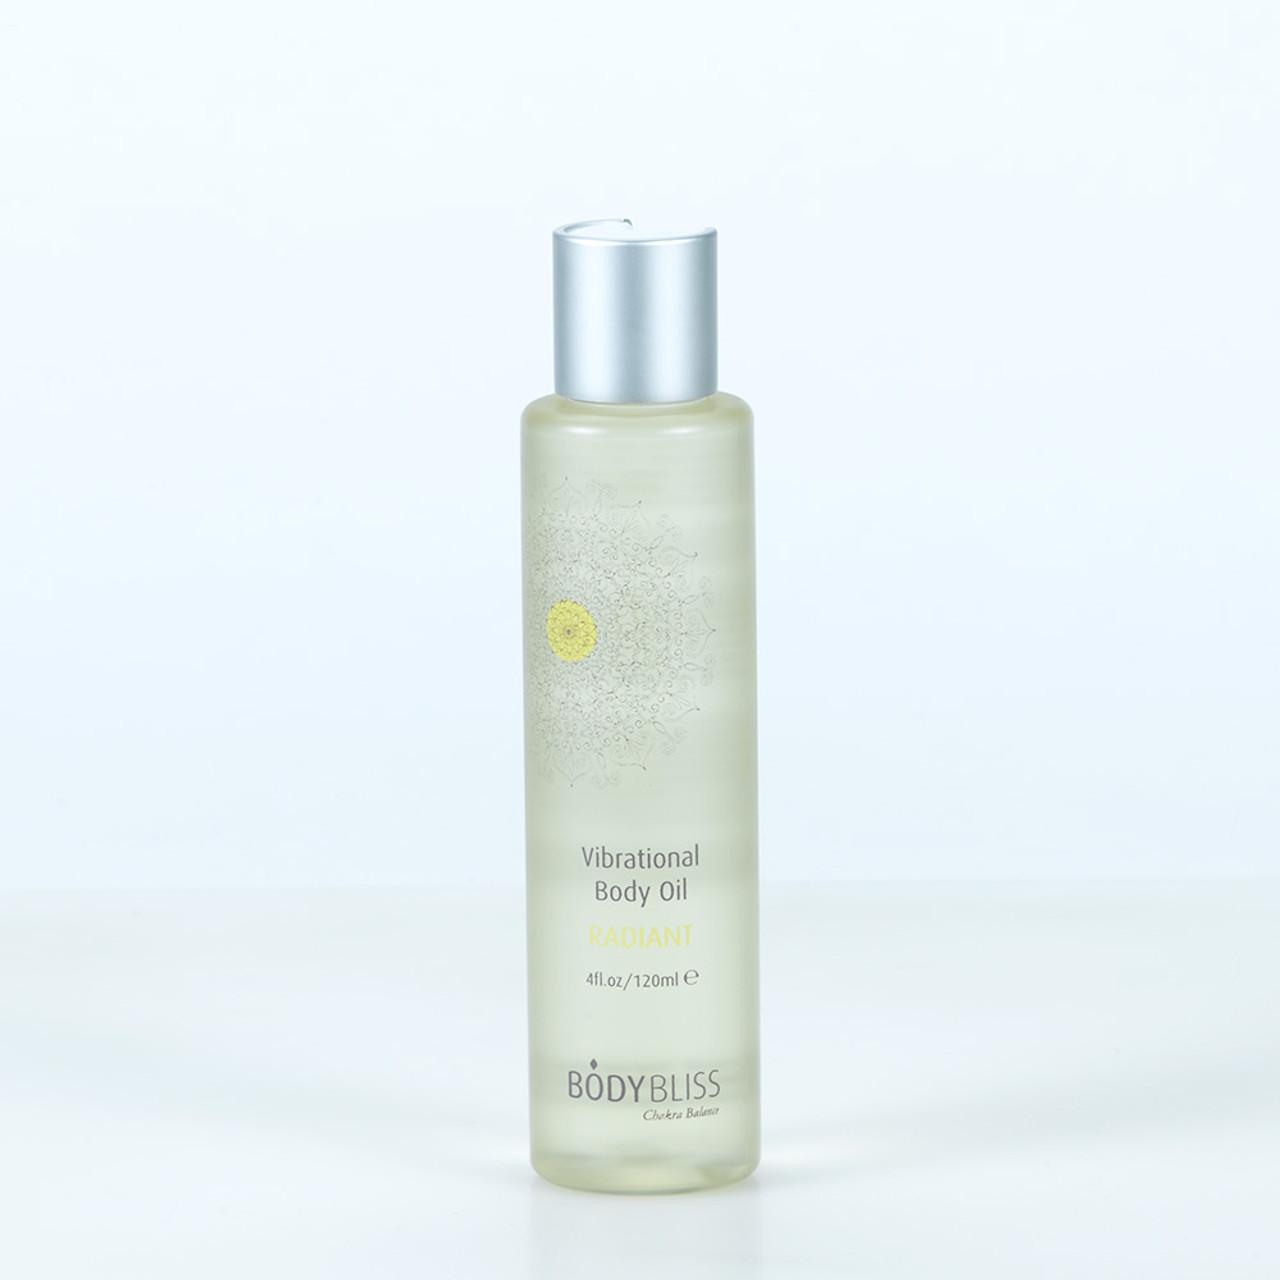 RADIANT Vibrational Body Oil